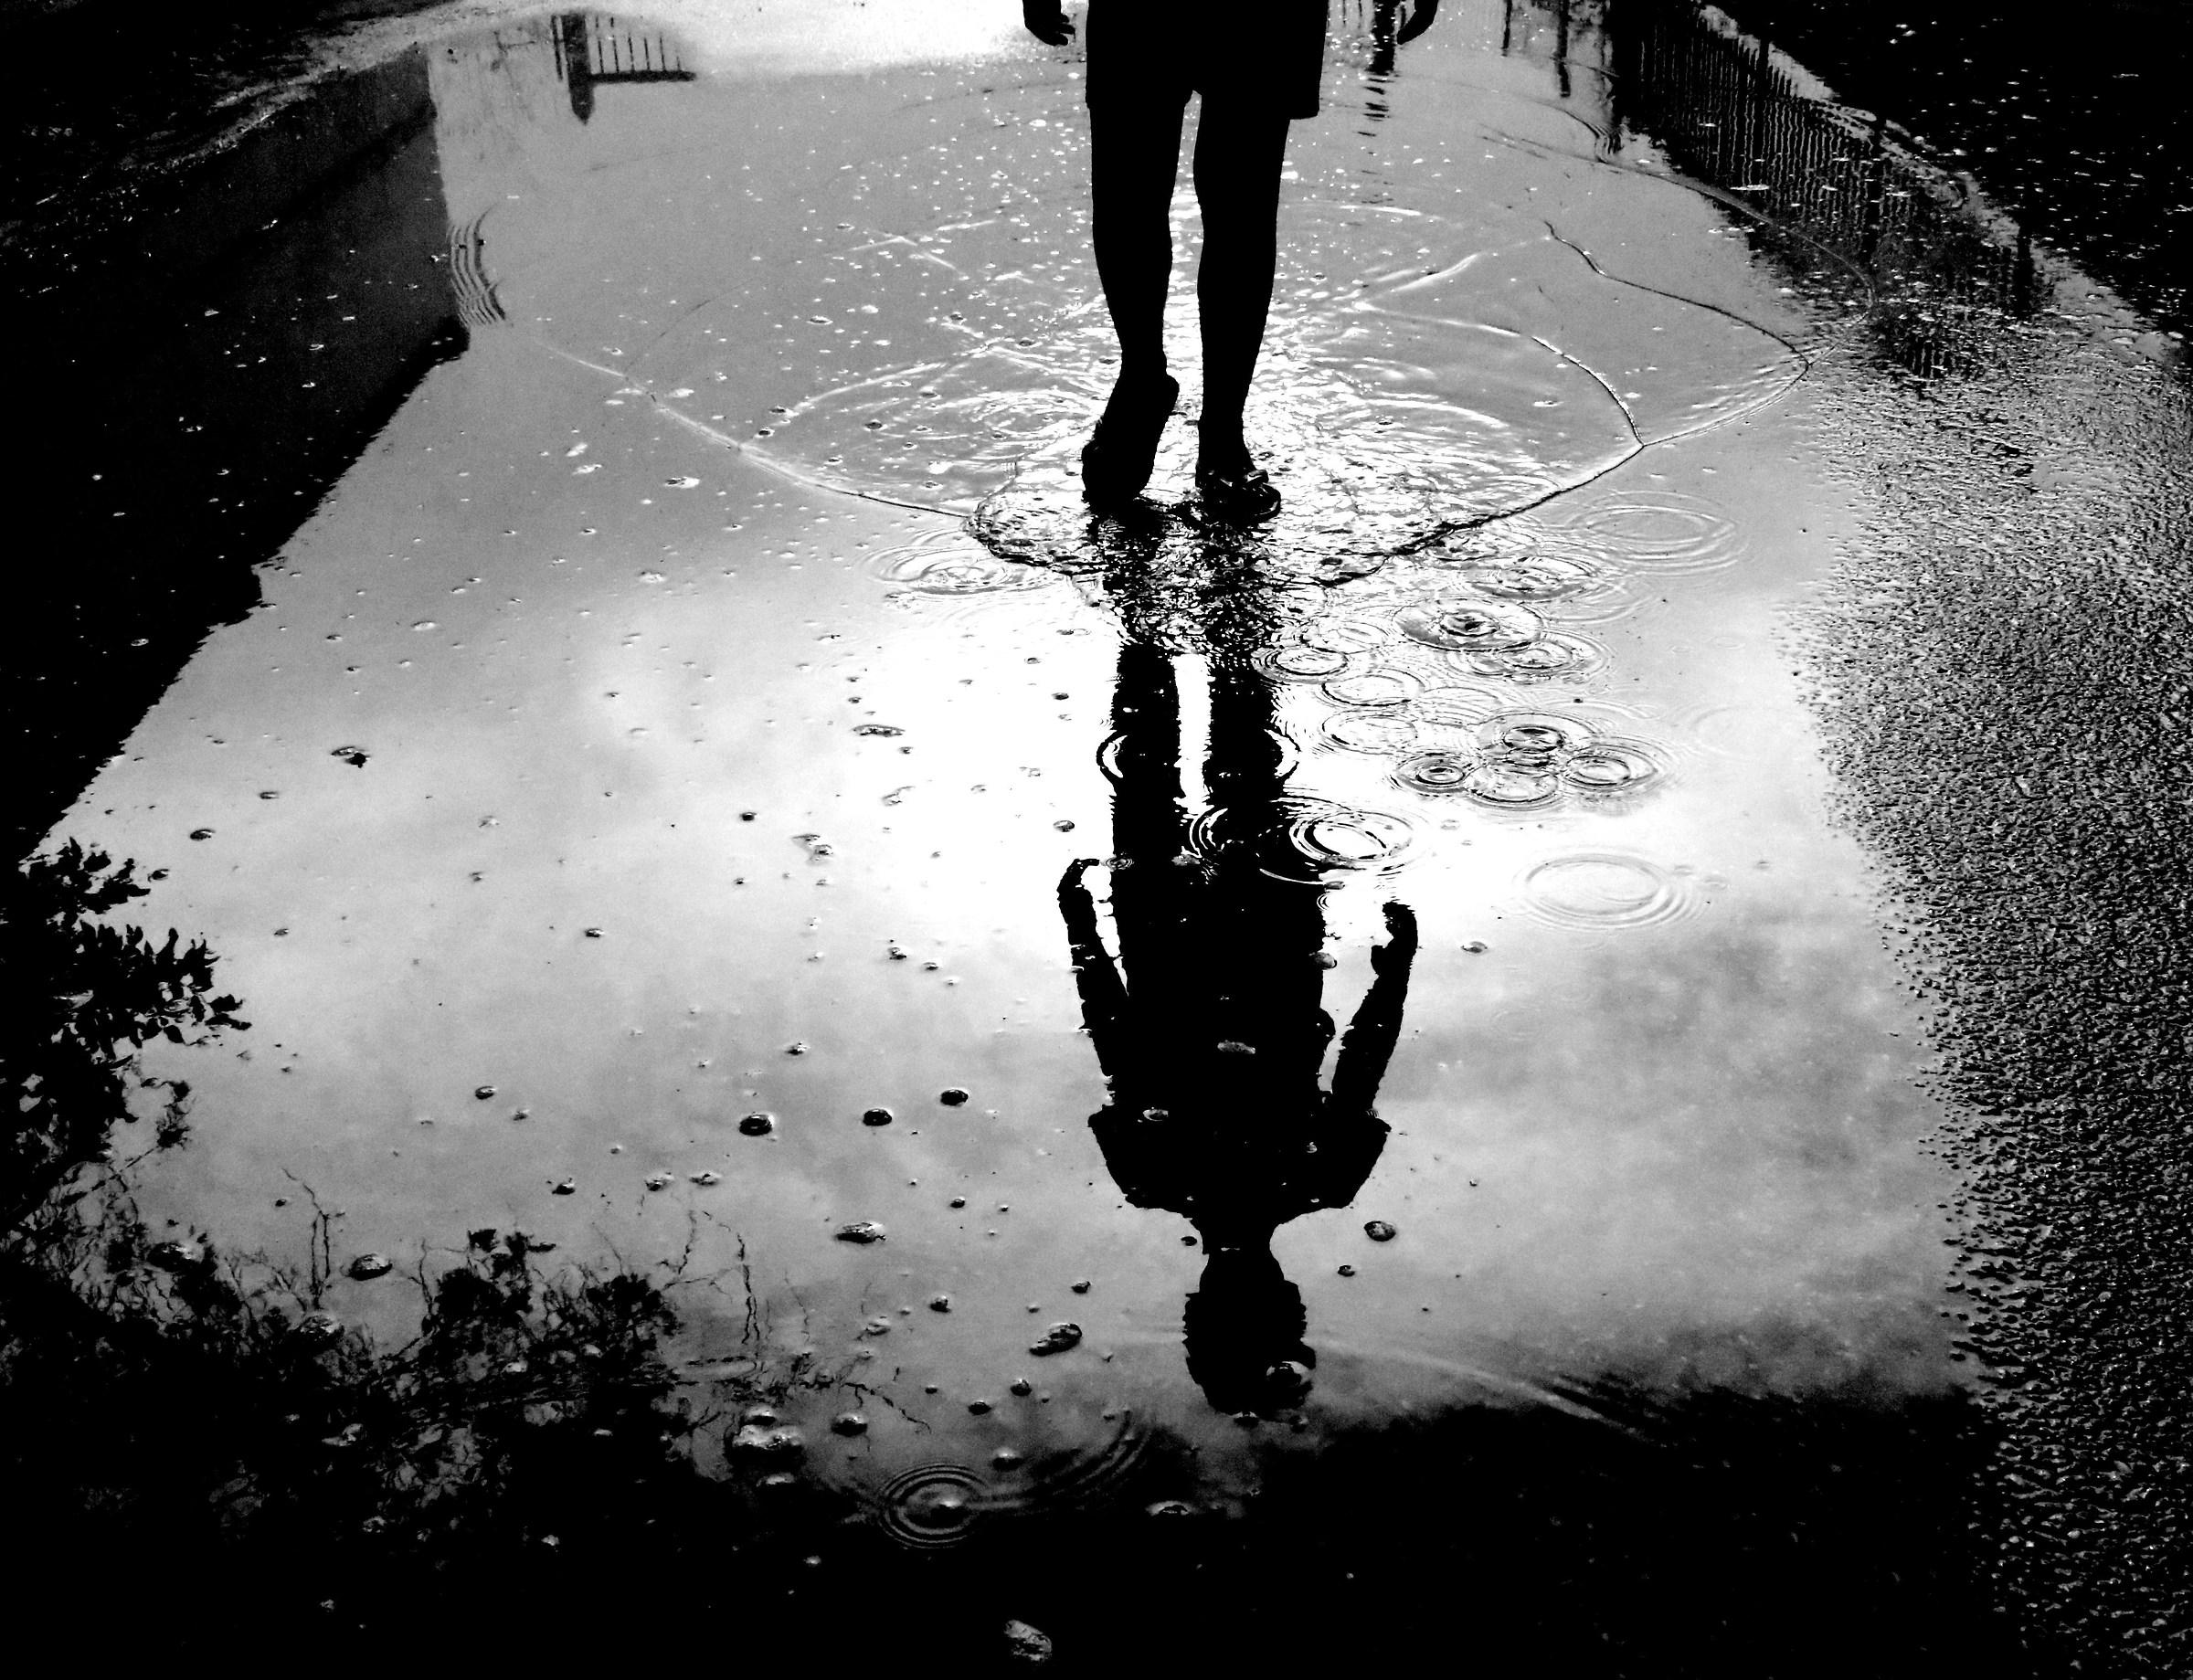 Shadow in the rain...